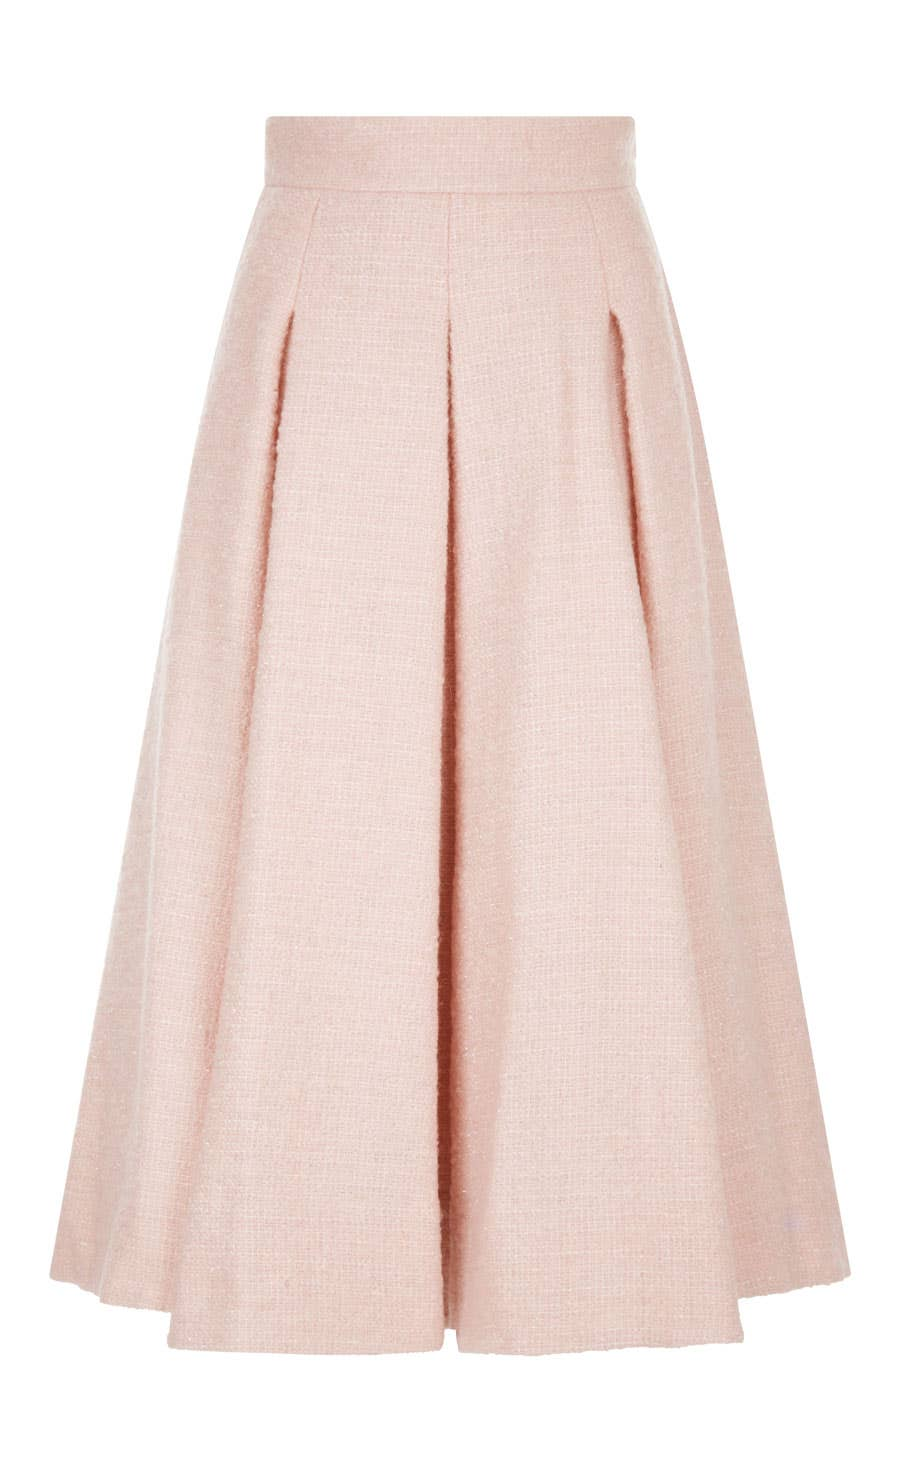 Palm Tailored Skirt, Rose Quartz